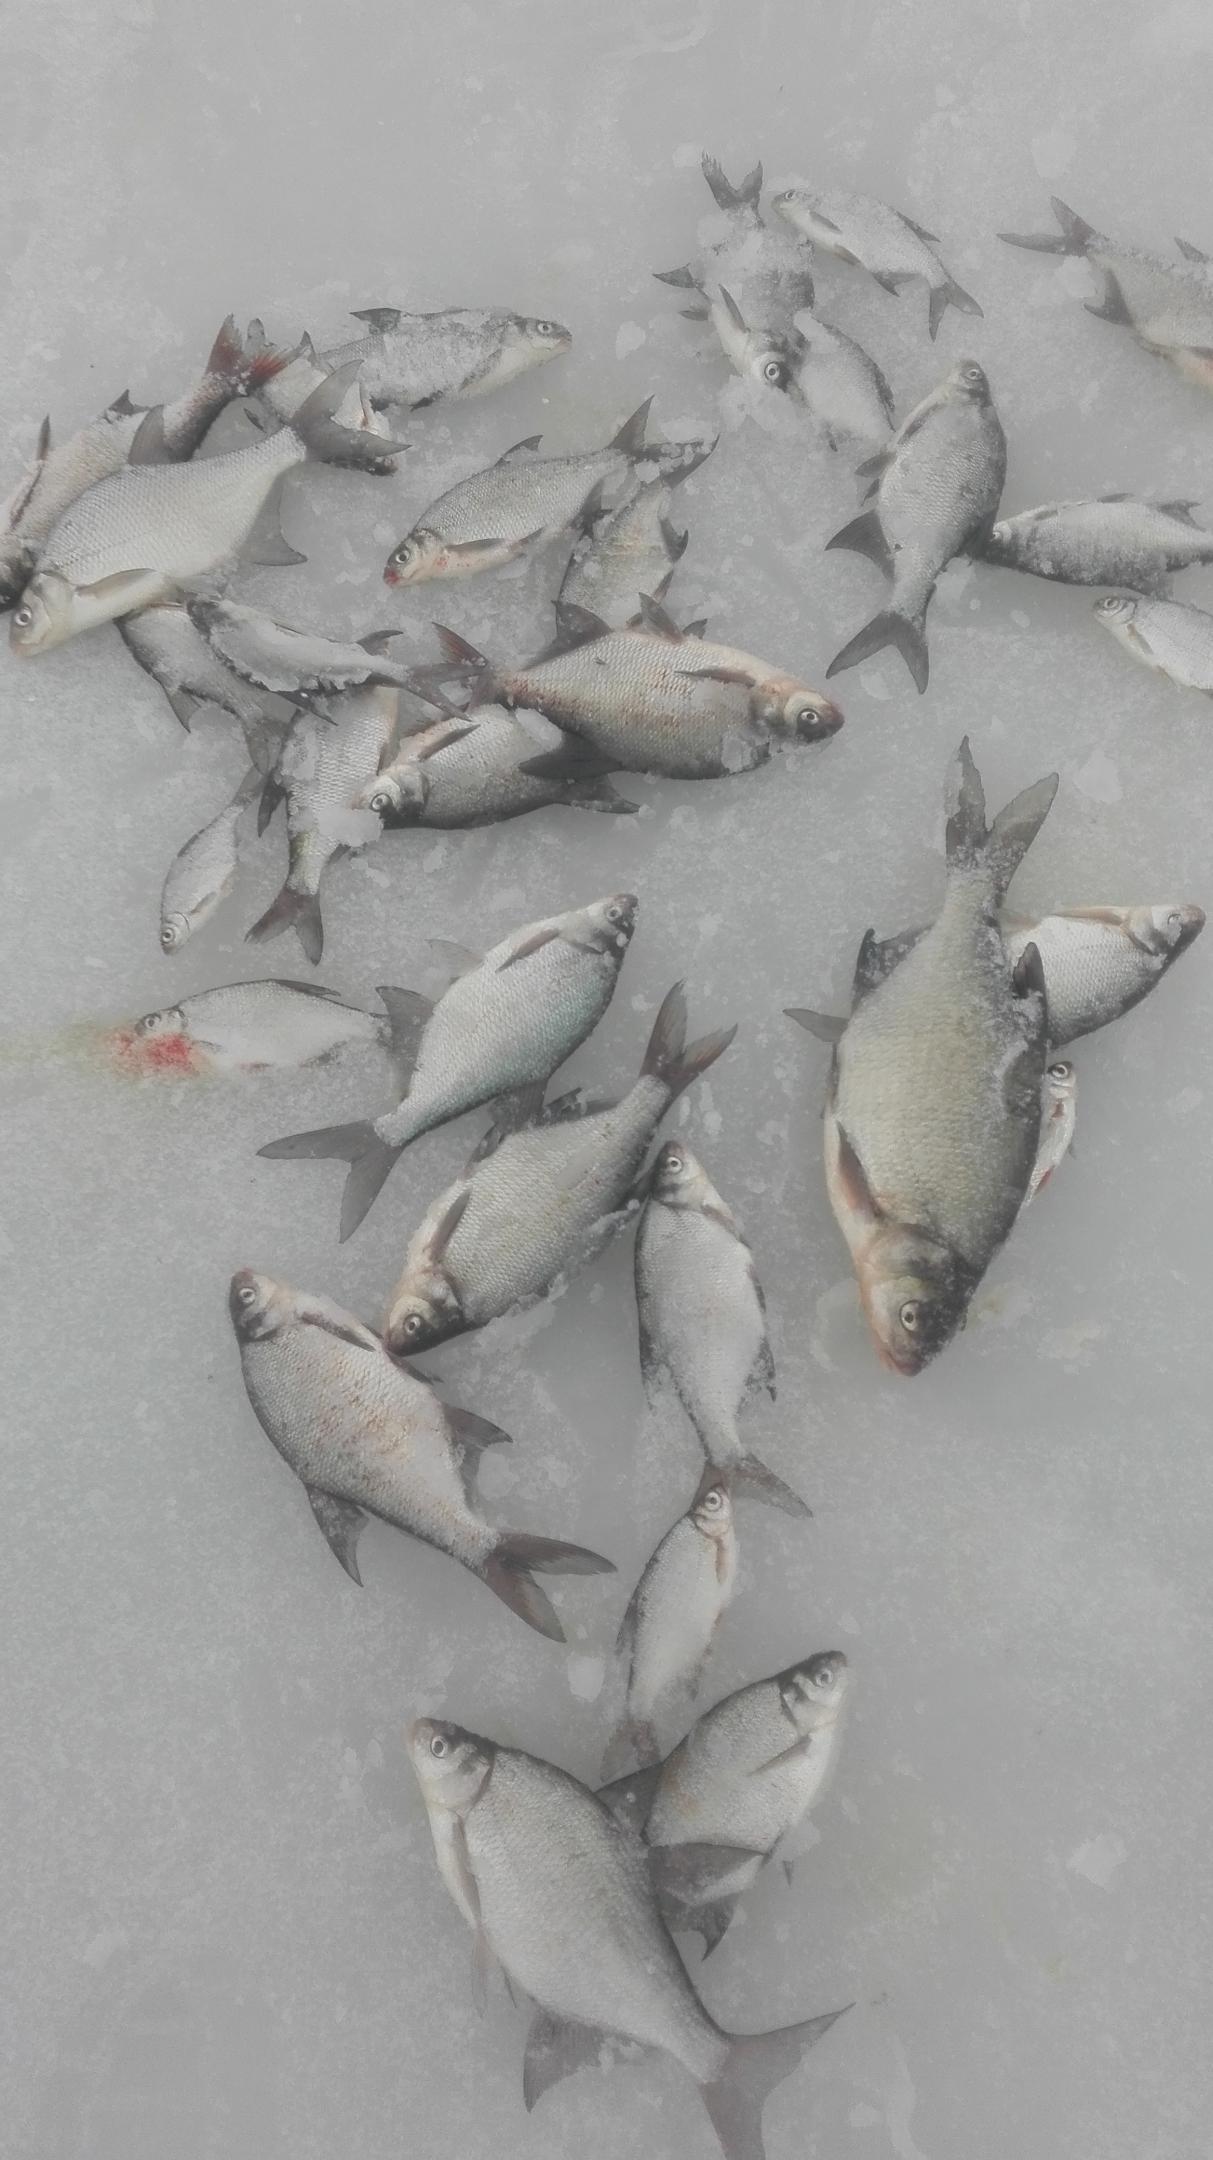 Снова посетил озеро,с надеждой на то что подлещики-лещи ...   Отчеты о рыбалке в Беларуси